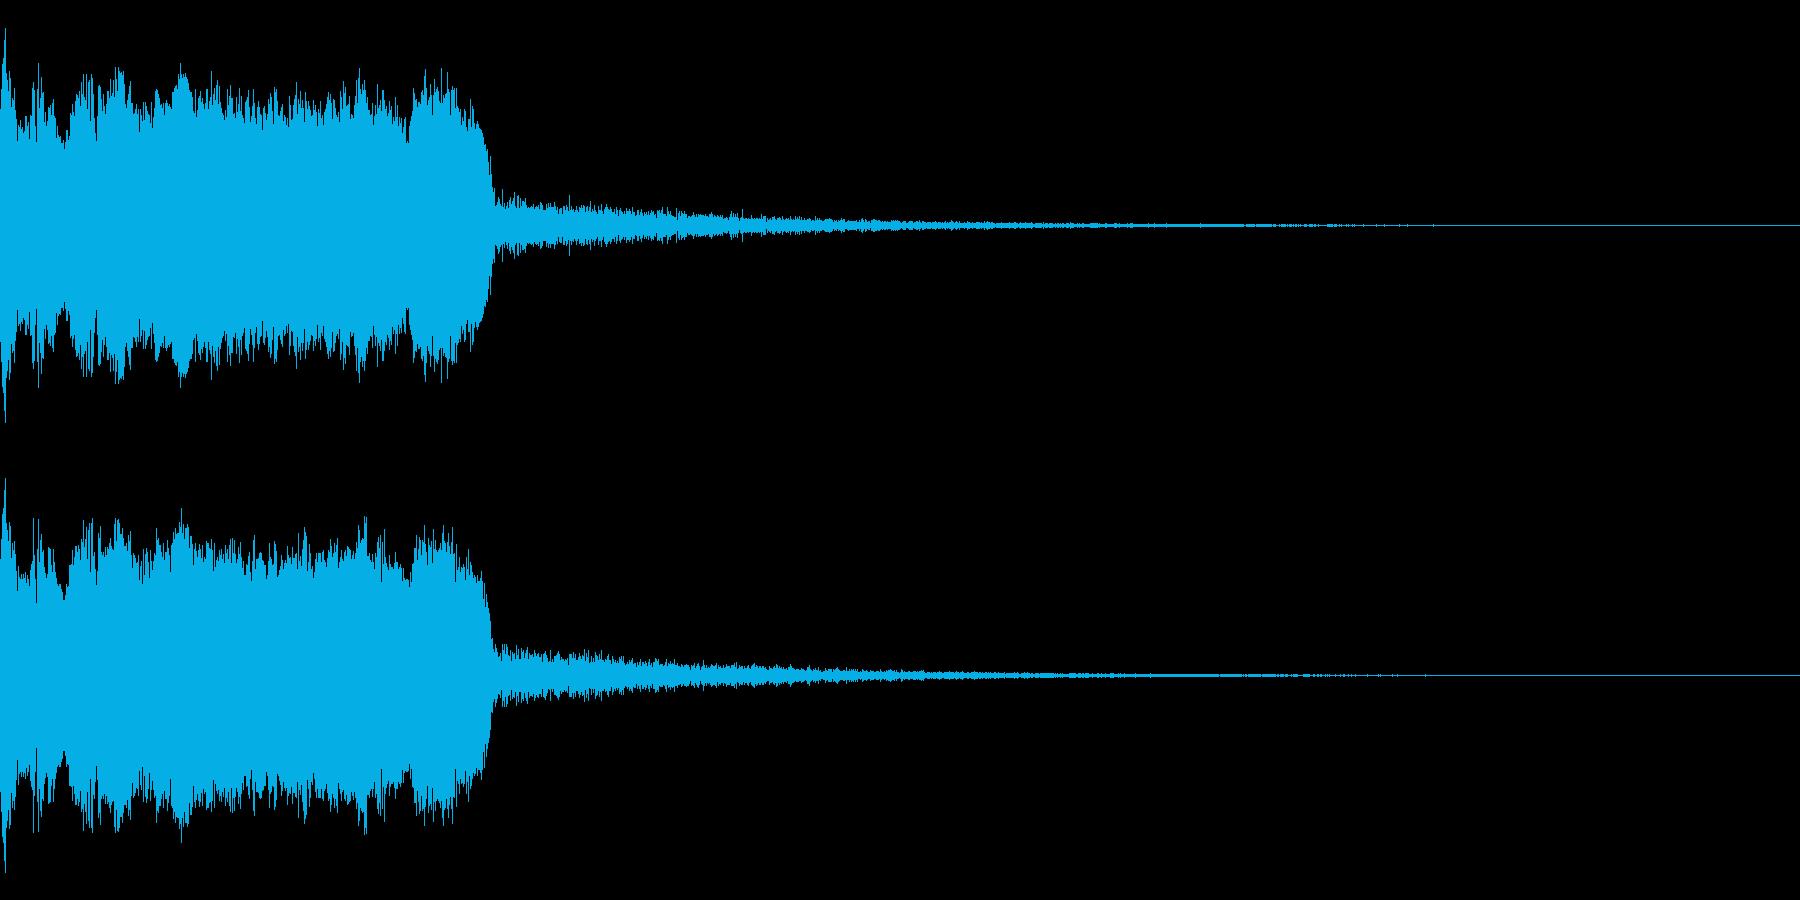 DJFX ヒットチャート発表前SE 31の再生済みの波形